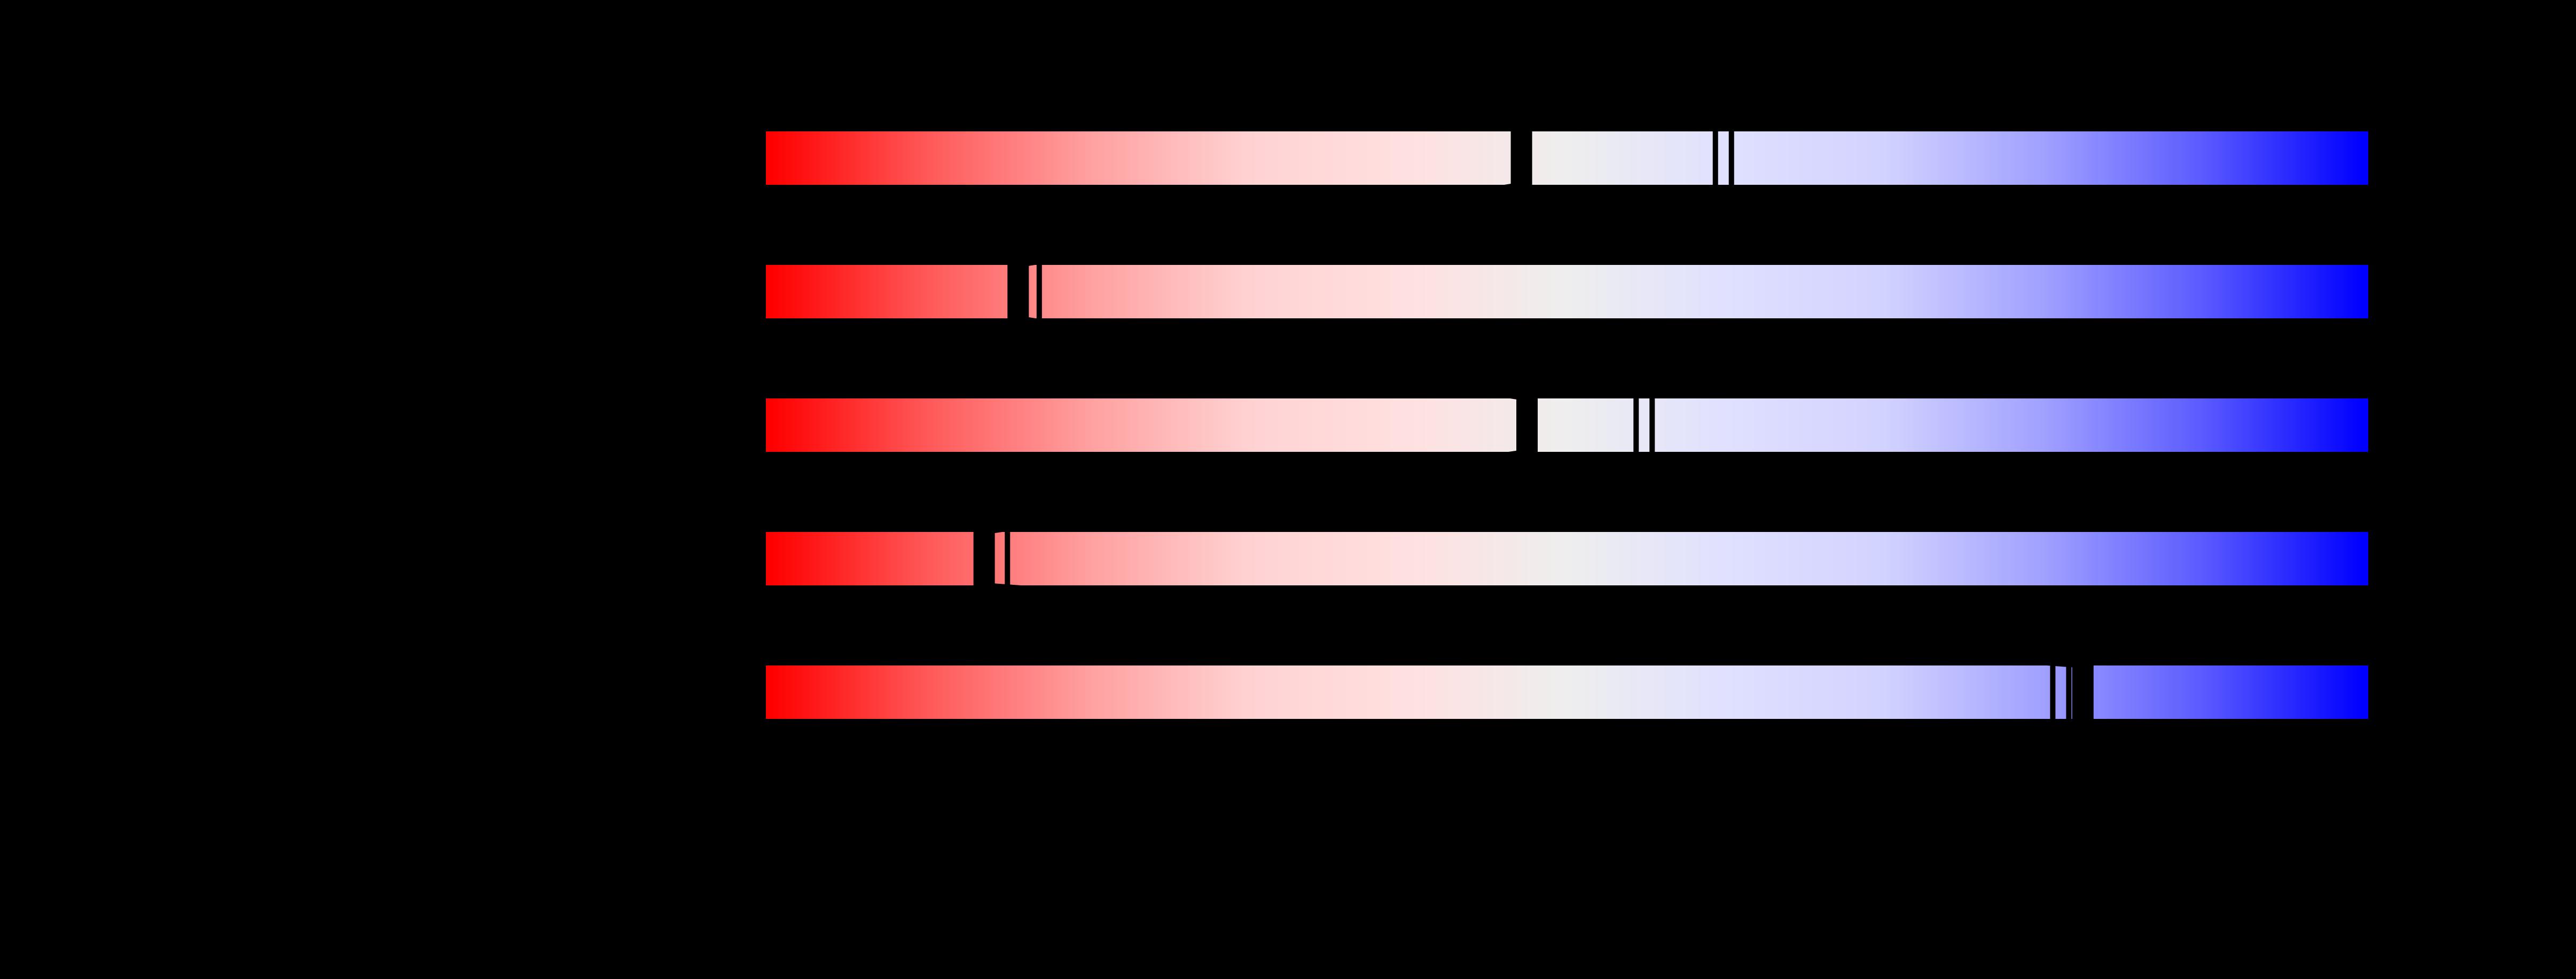 RCSB PDB - 4BMQ: Crystal Structure of Ribonucleotide